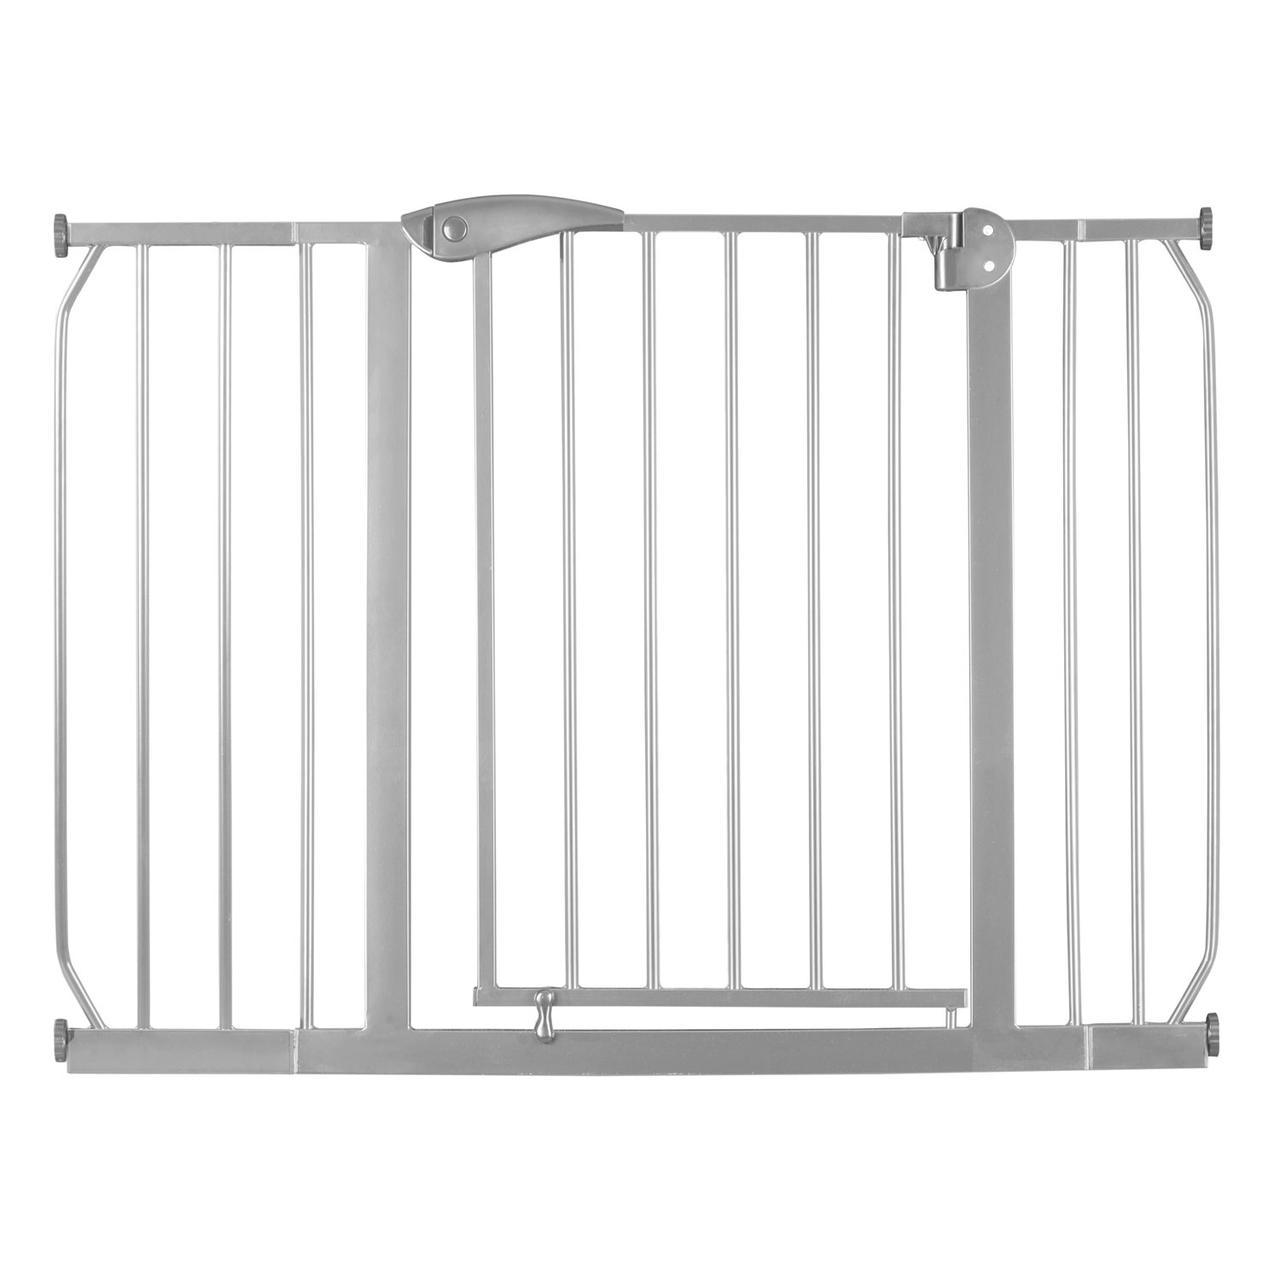 Барьер ворота безопасности 75-115 см Ricokids 7408 (9354)